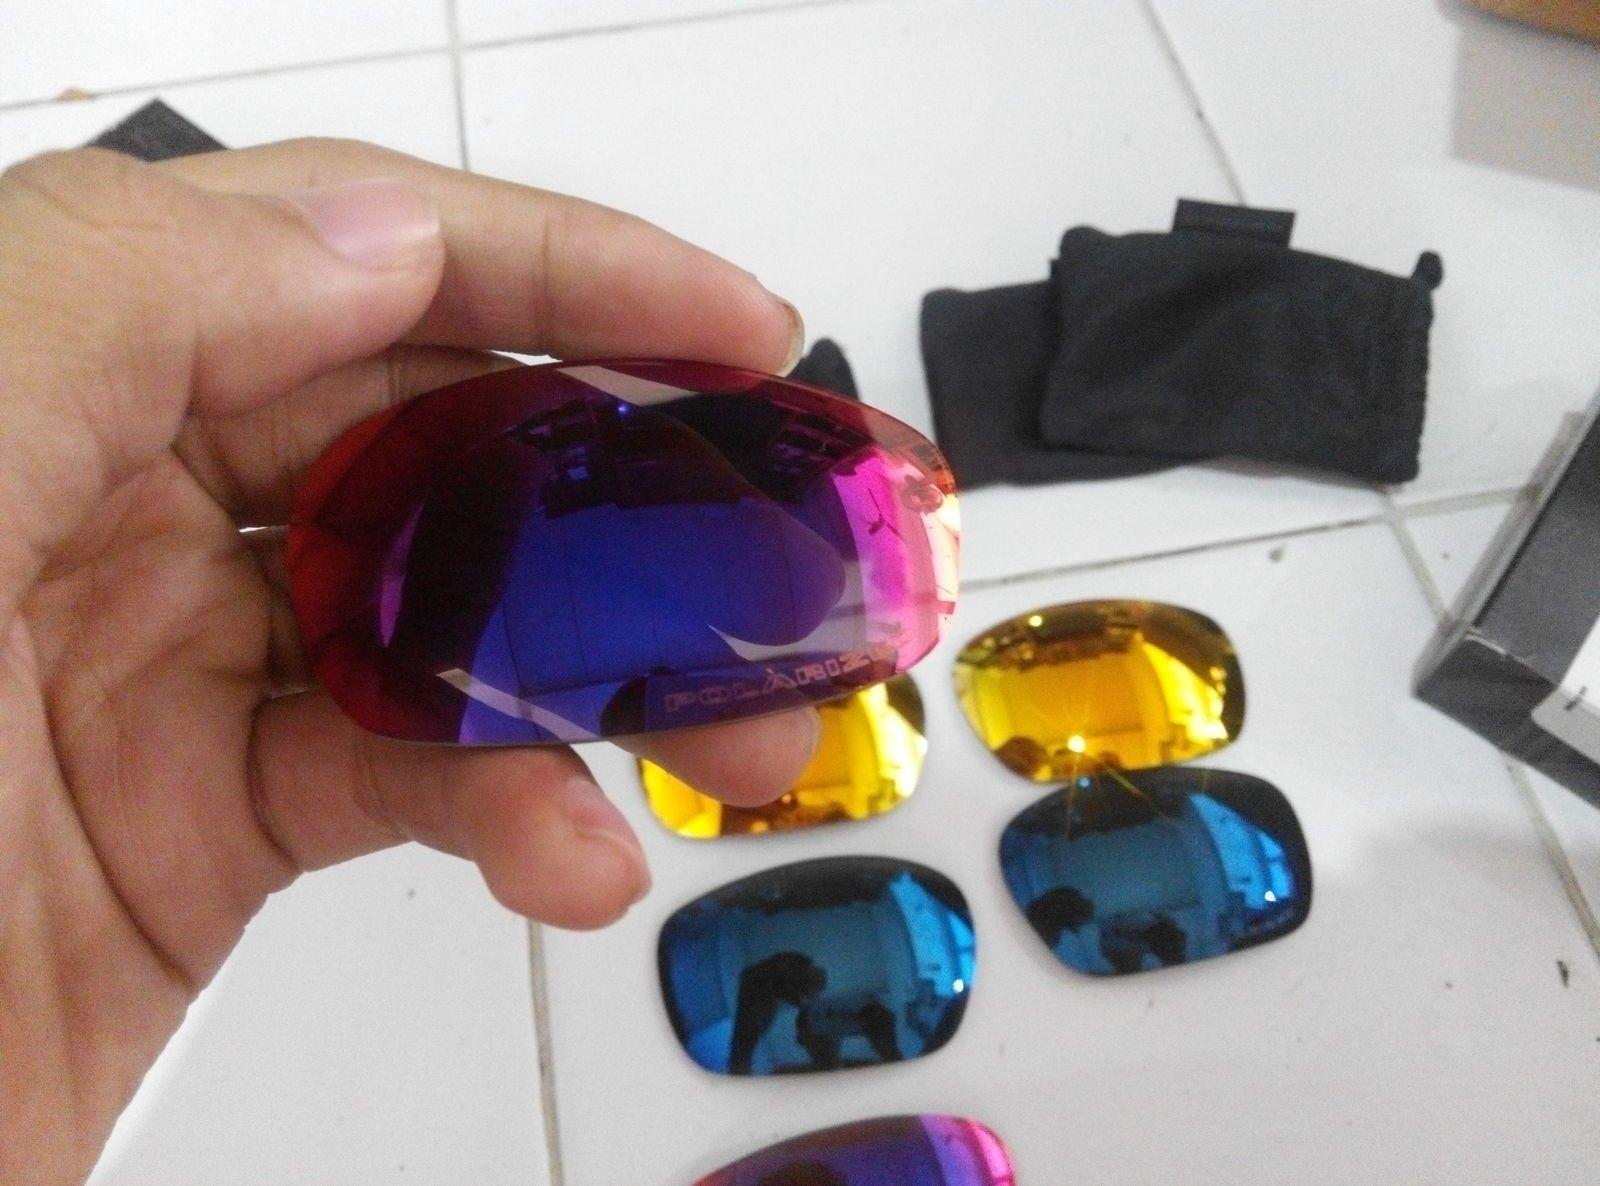 Jawbone & dispatch 2 lenses price drop - IMG_20150910_123649.jpg